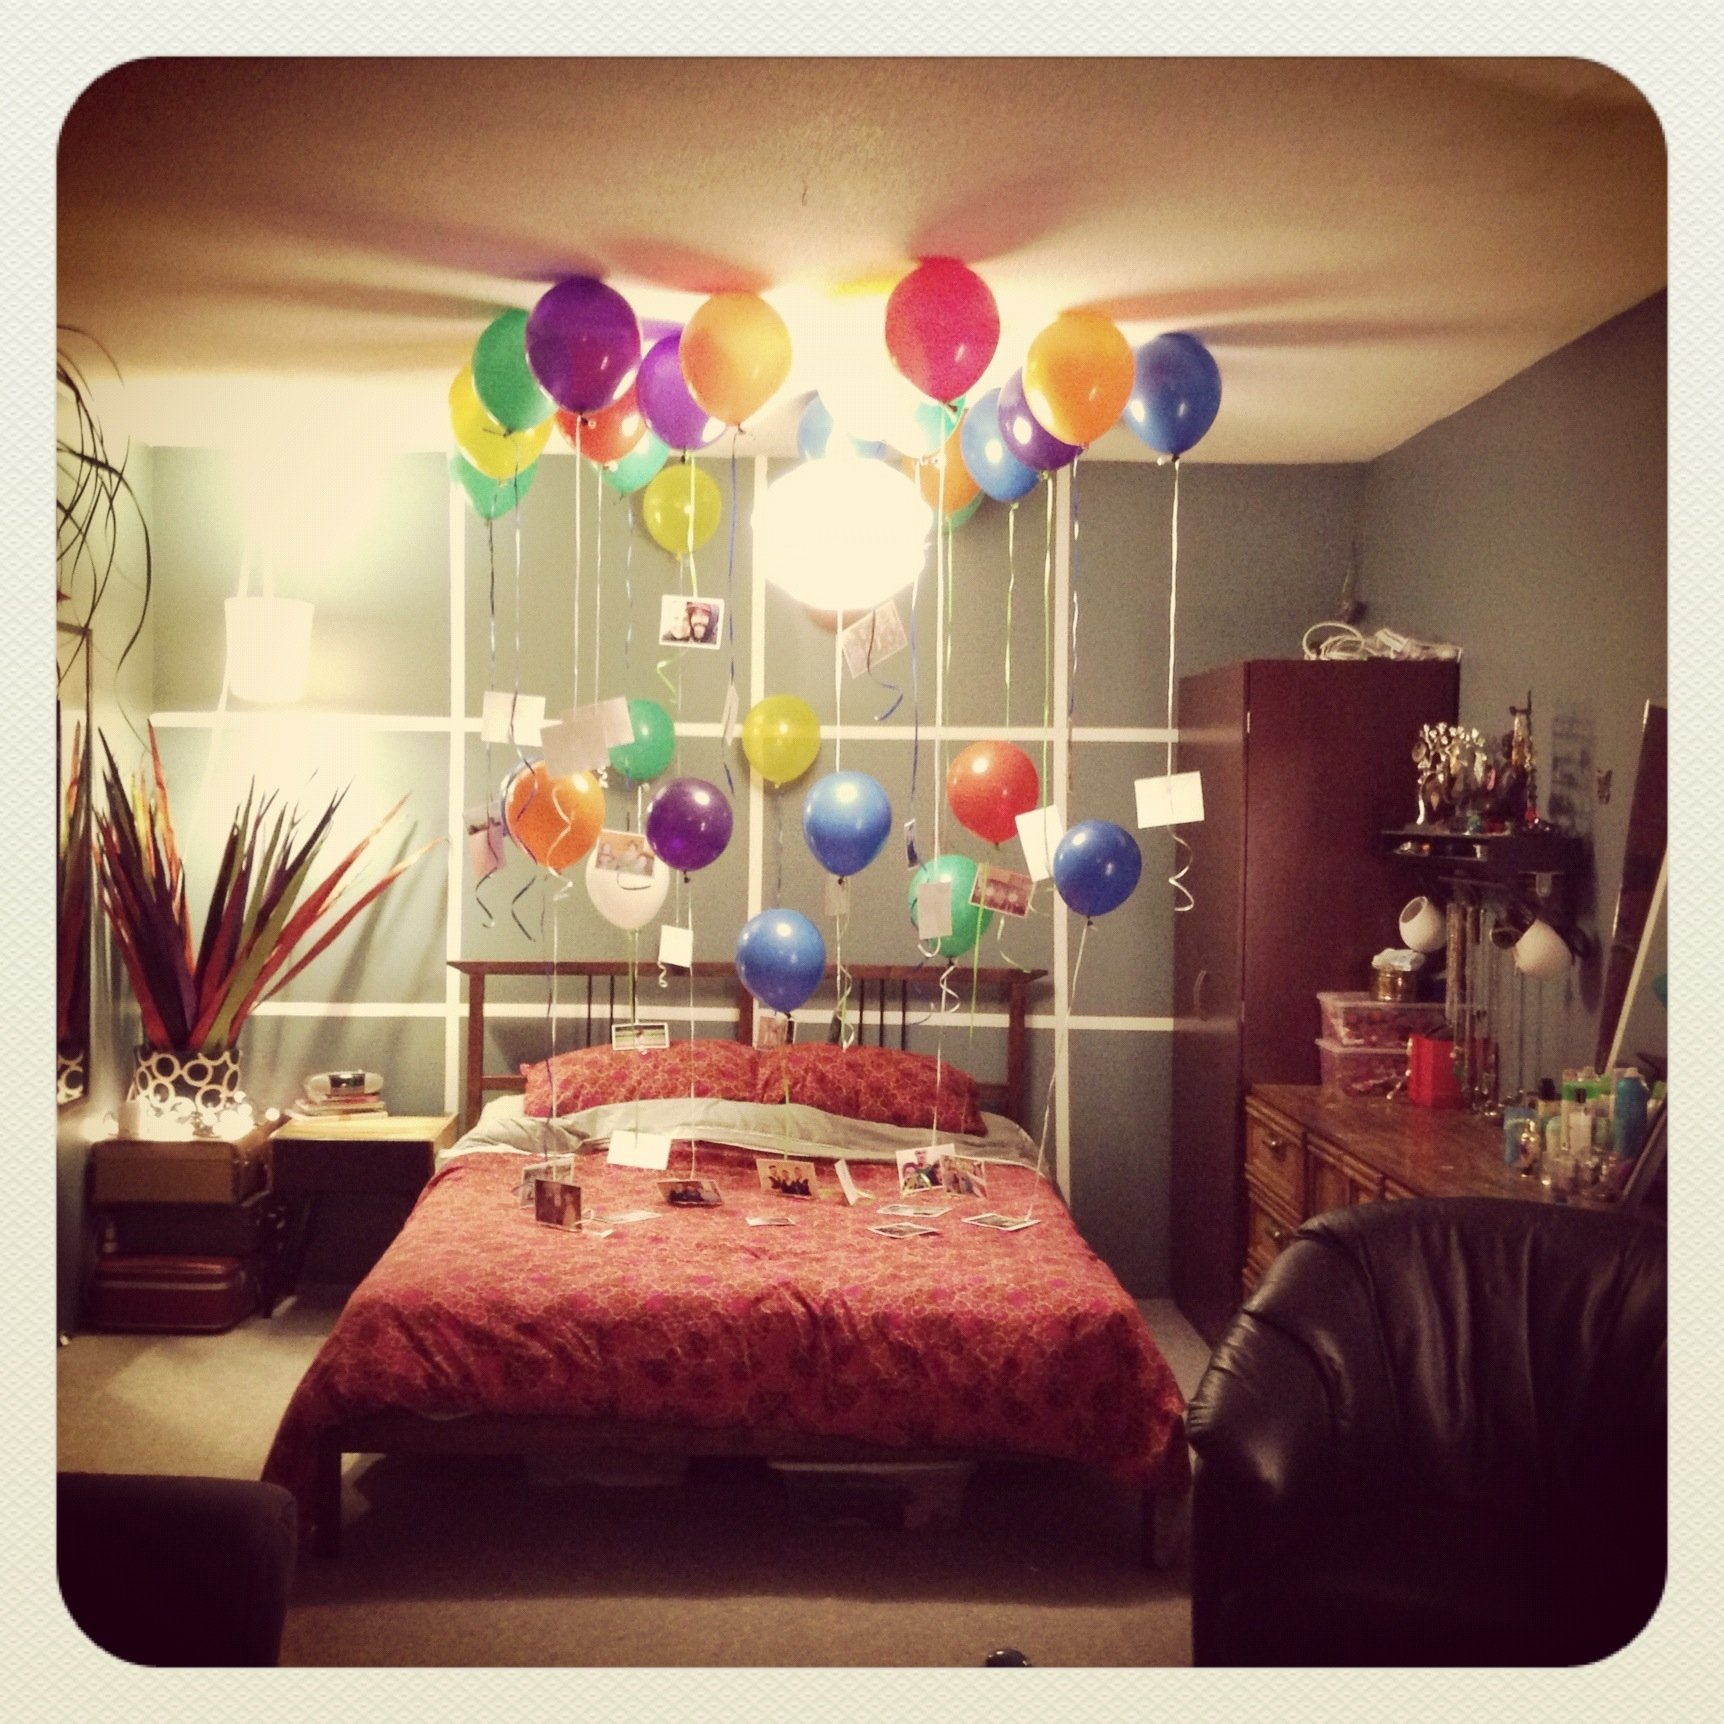 10 Pretty Romantic Birthday Ideas For Boyfriend birthday surprise for the boyfriend good ideas ya say 2